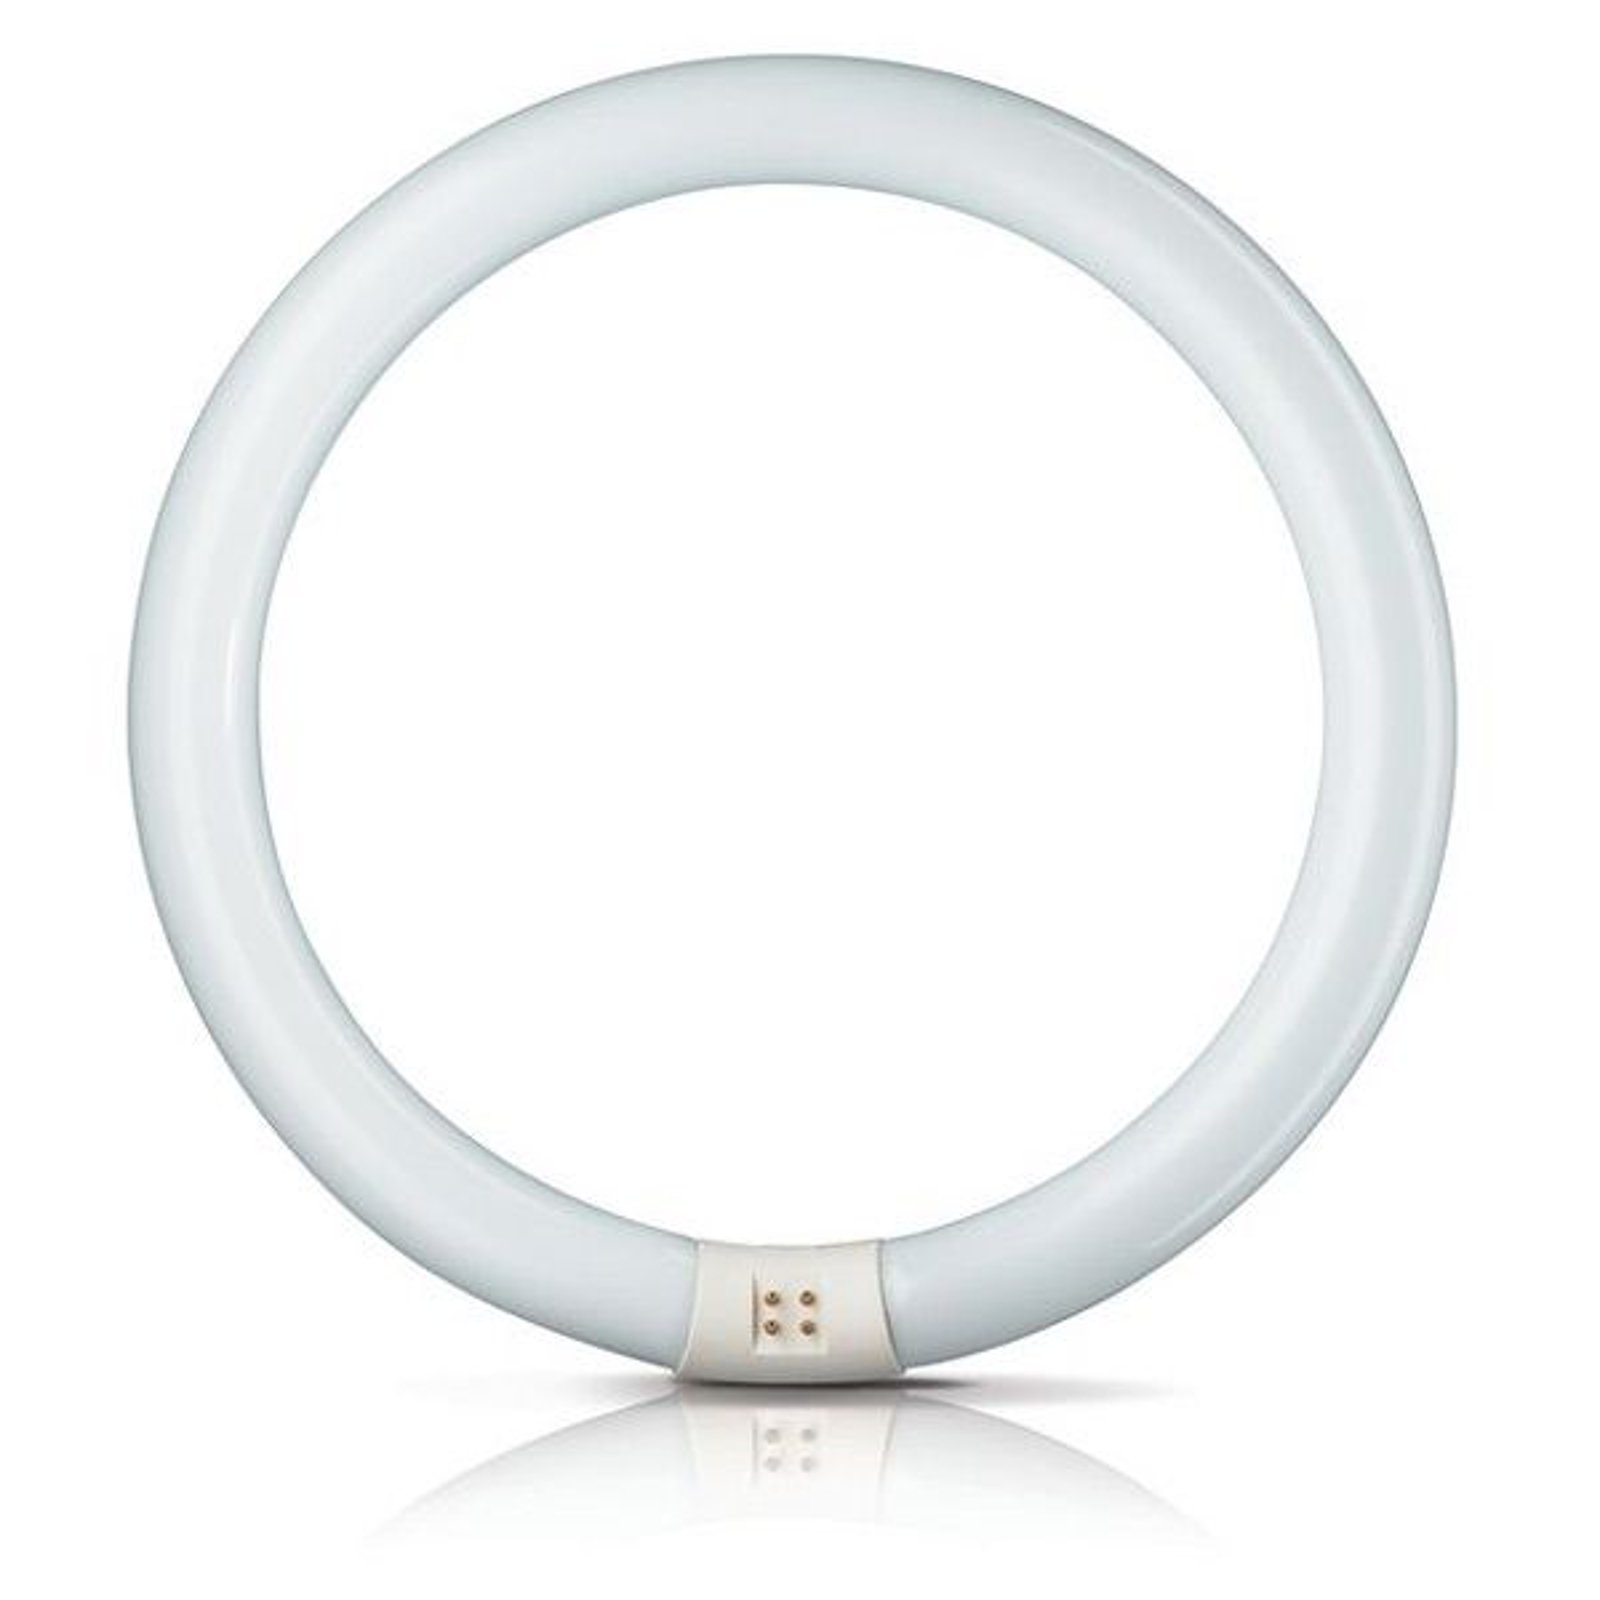 G10q 22W 865 lysstoffring Master Circular TL-E